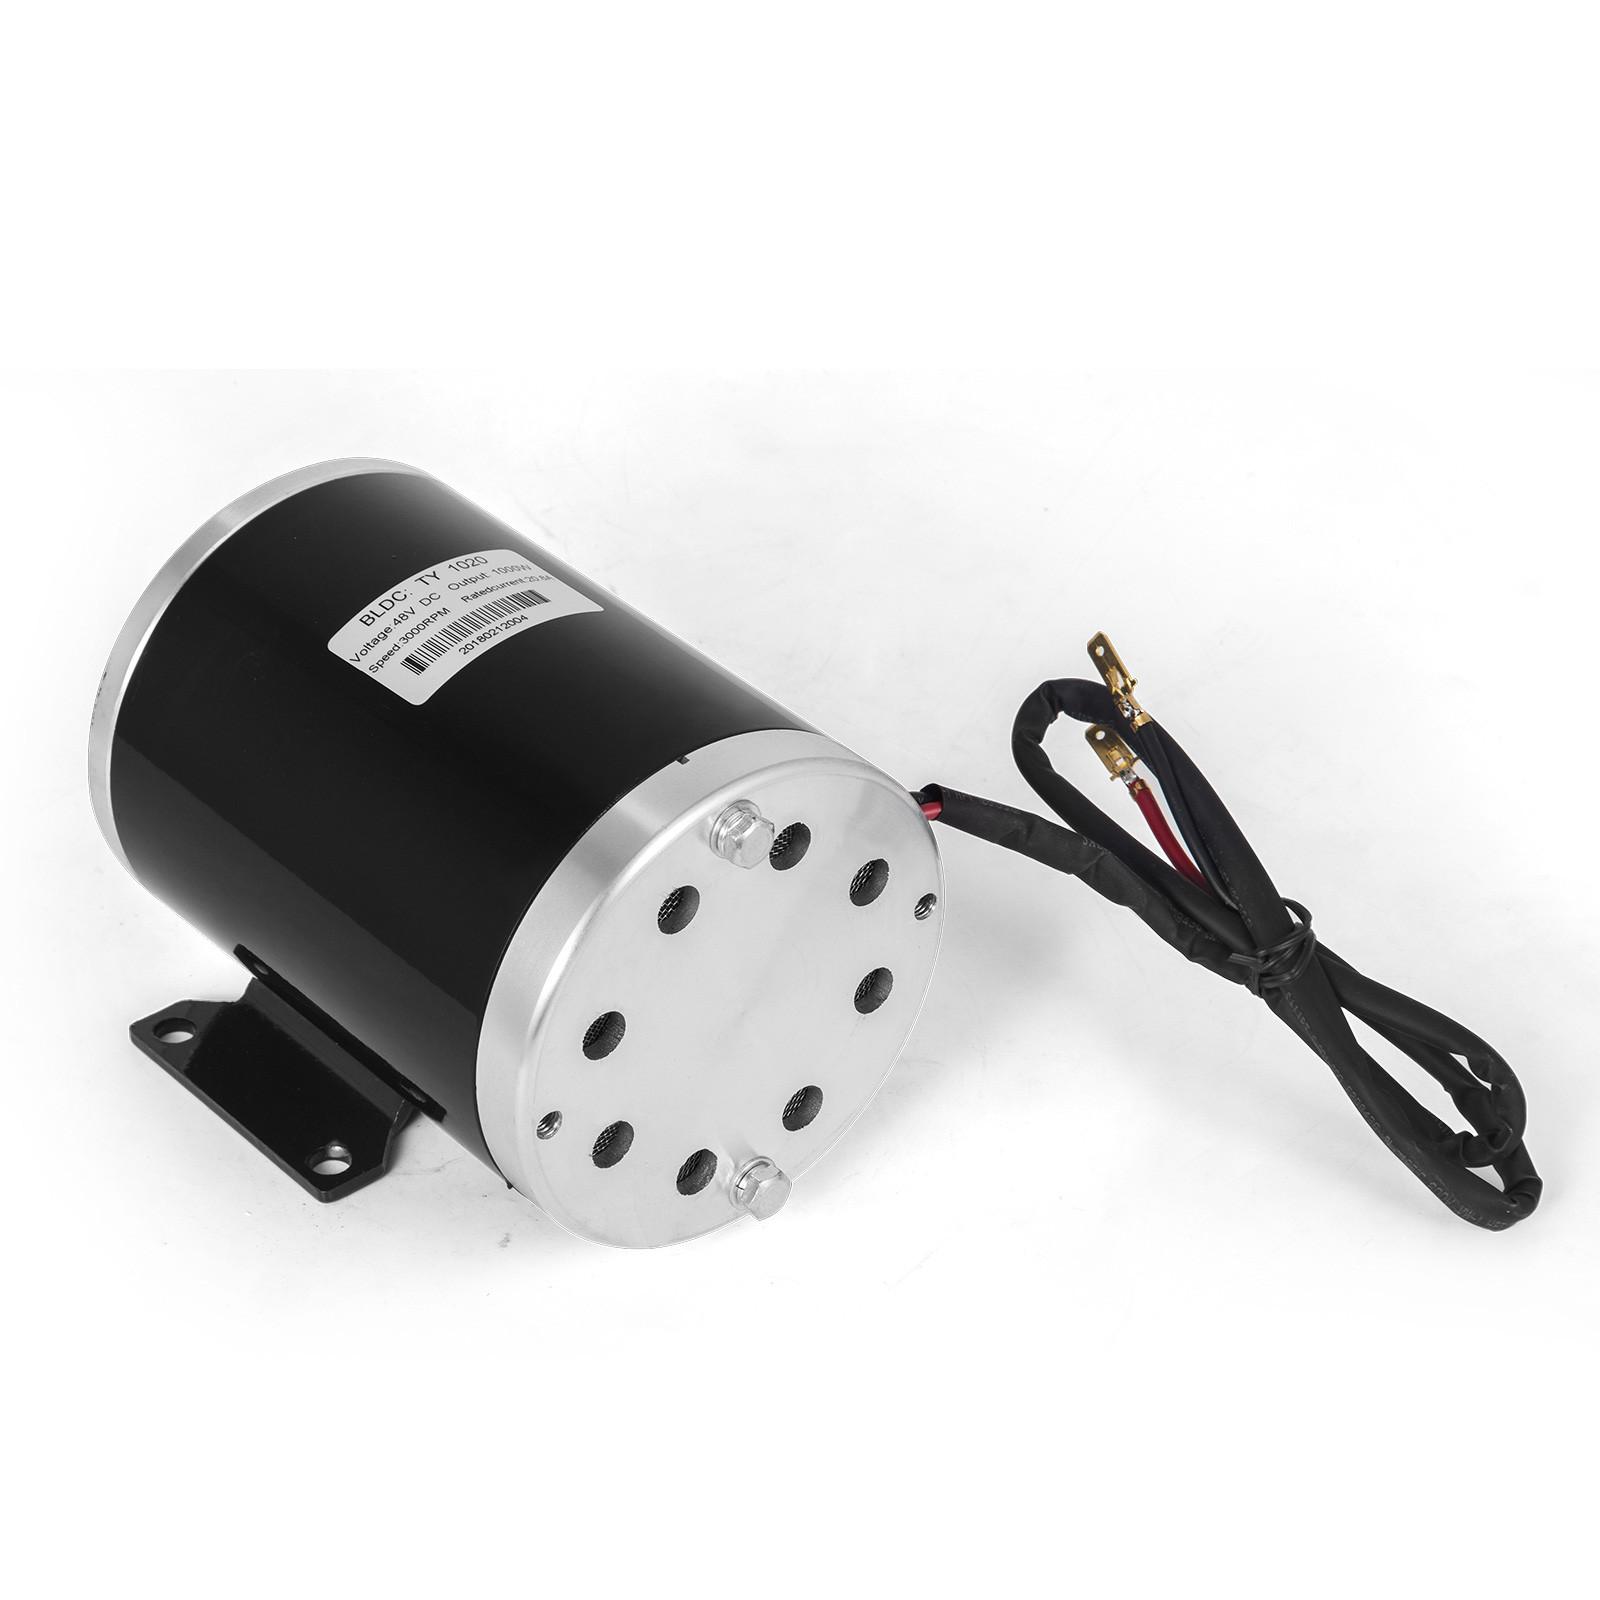 1800W-48V-DC-Brushless-Electric-Motor-Kit-f-Scooter-500-1800W-E-Bike-Go-Kart thumbnail 30